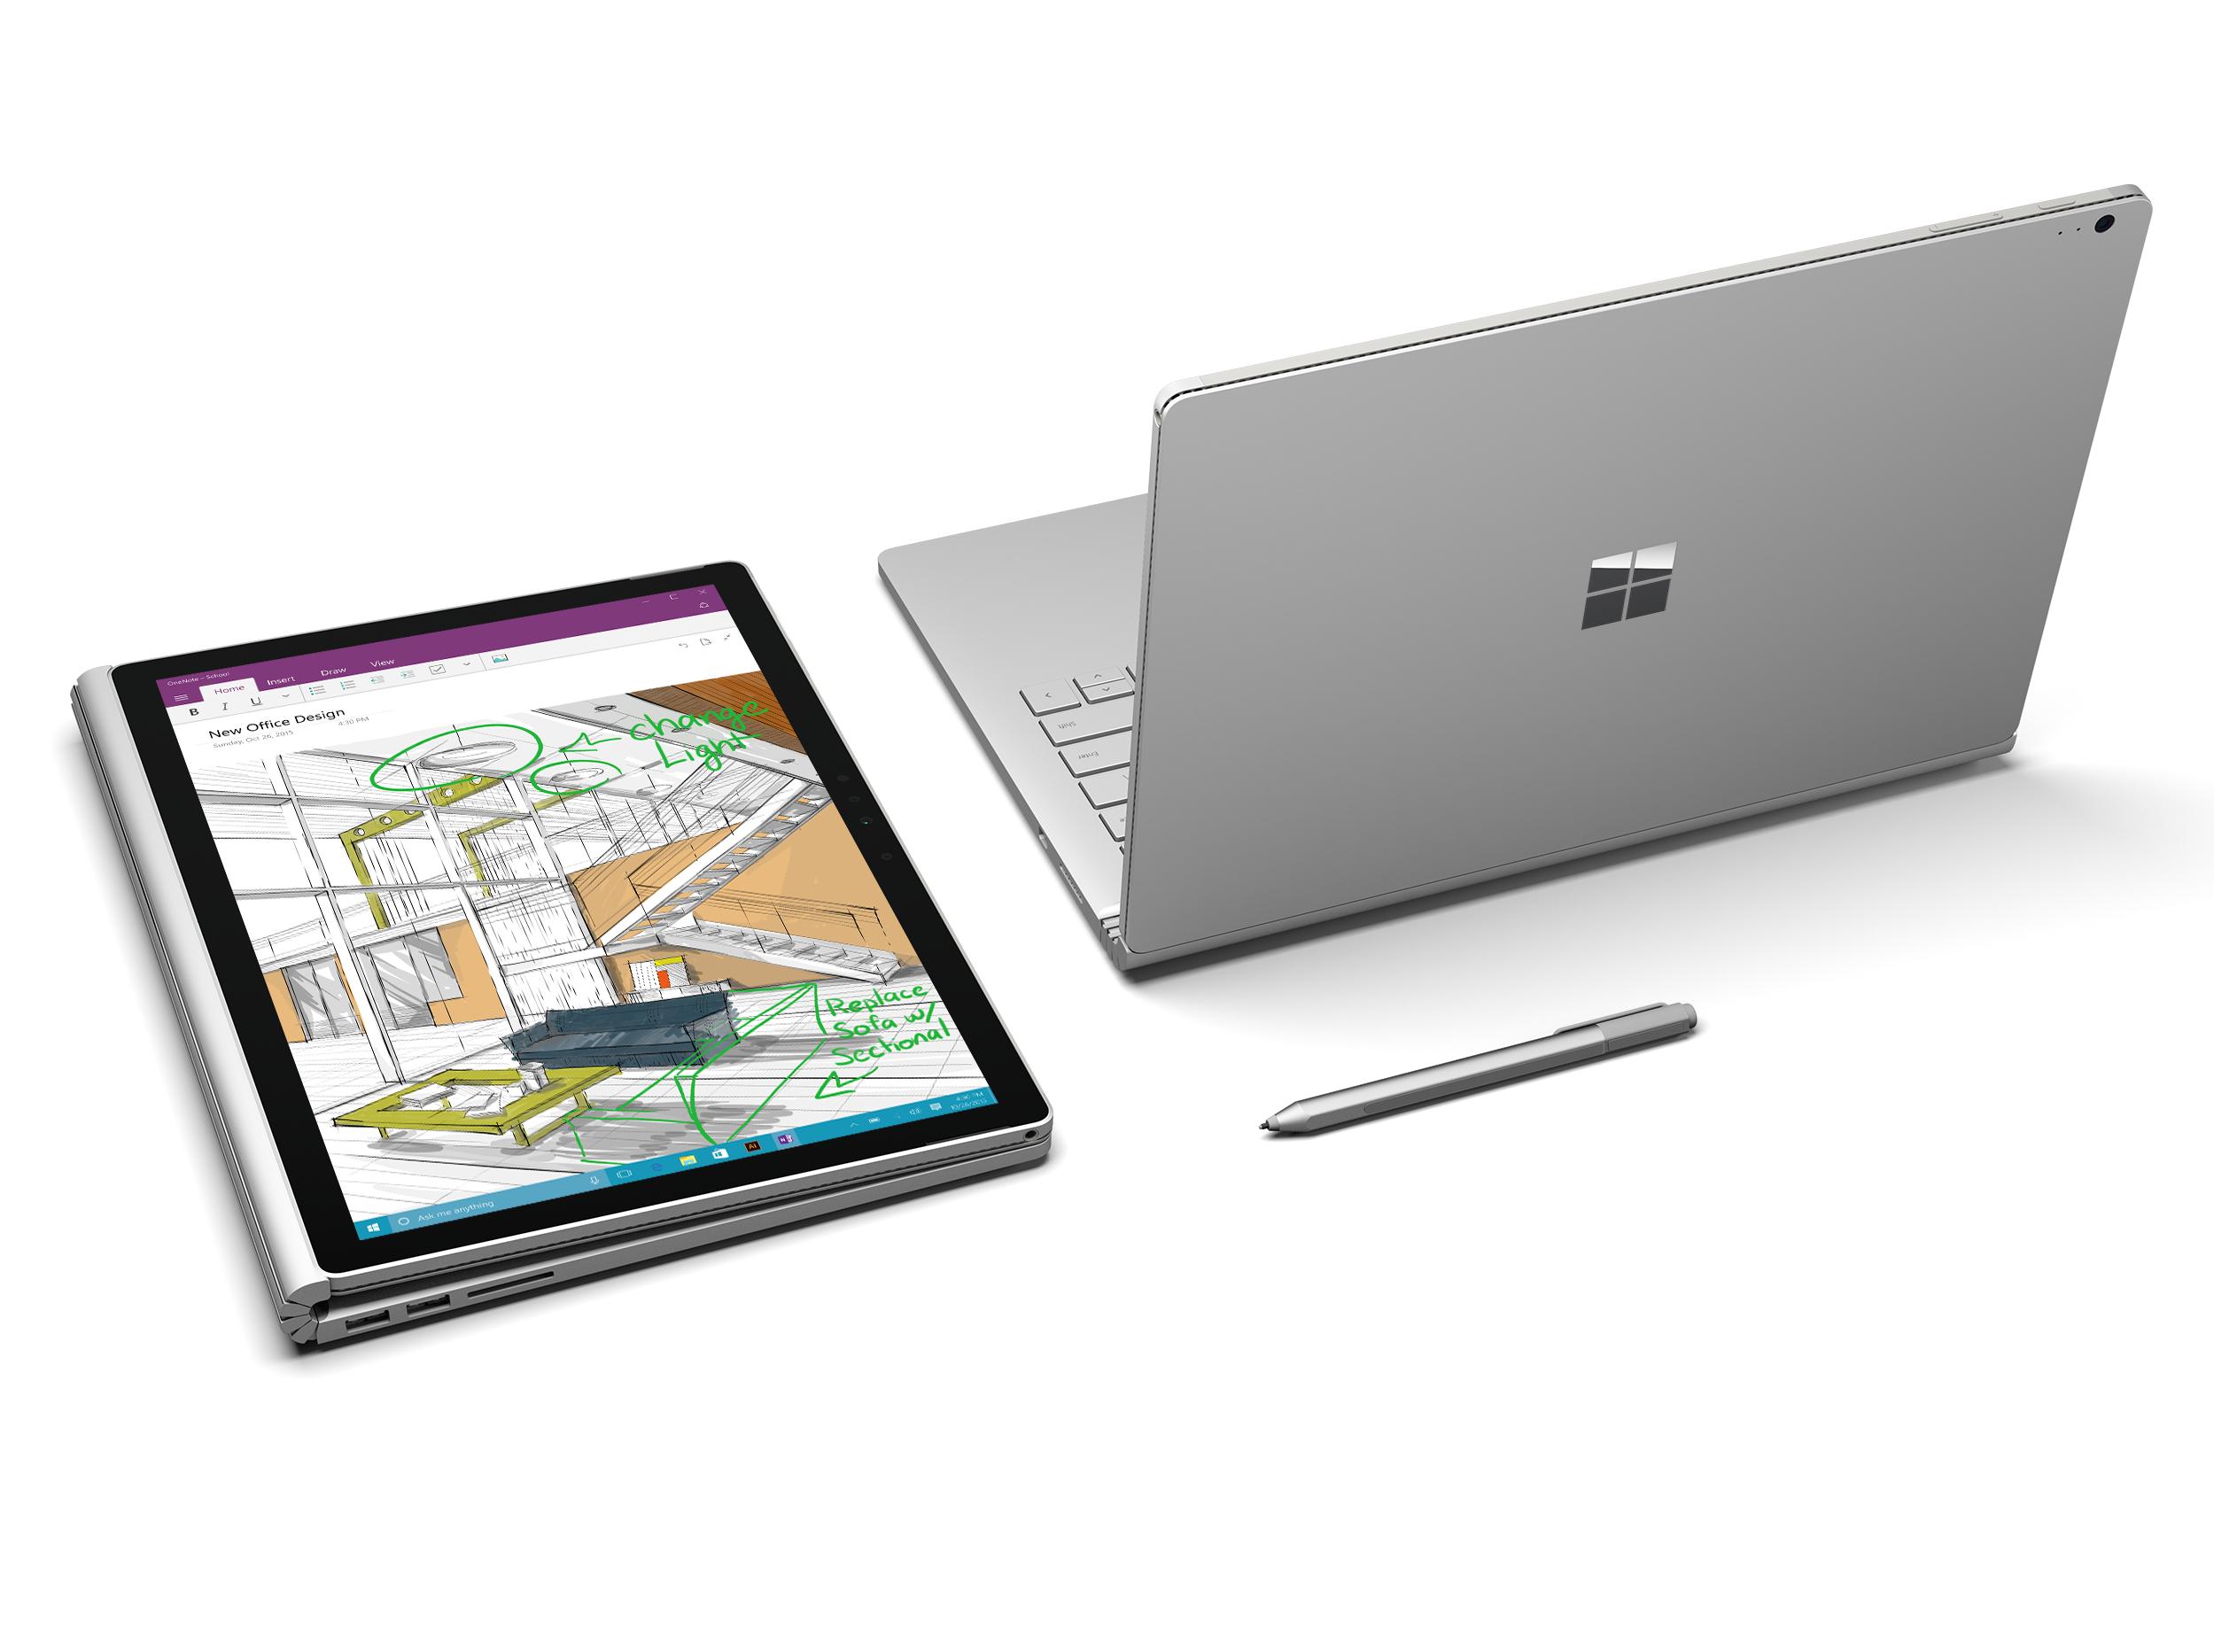 Microsoft Surface Book Core I5 - 8GB - 256GB - Qwerty - Windows Pro [Cyber Monday]